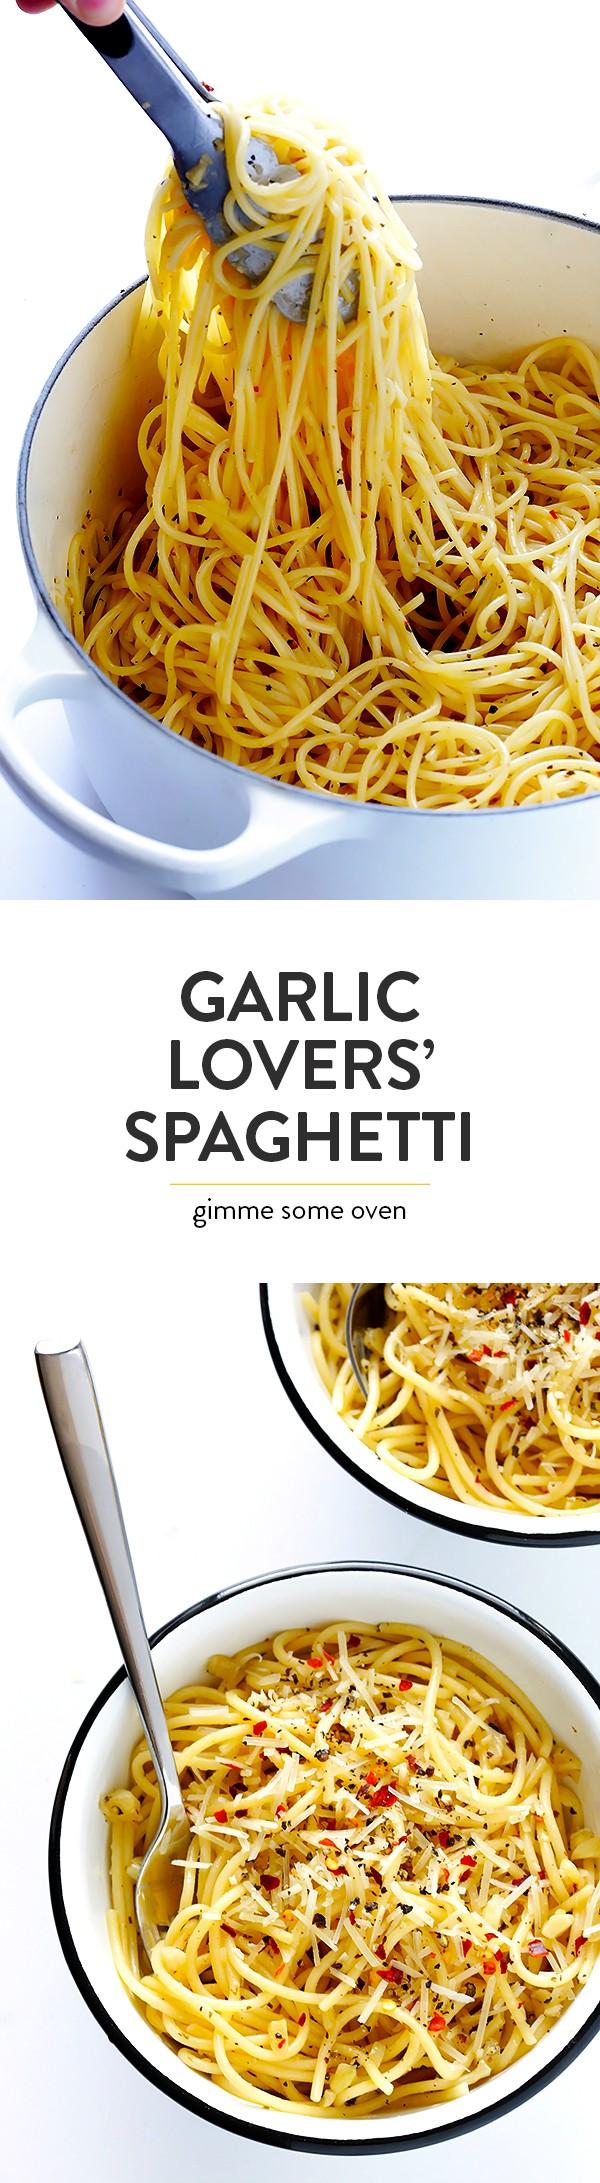 Get the recipe Garlic Lovers Spaghetti @recipes_to_go